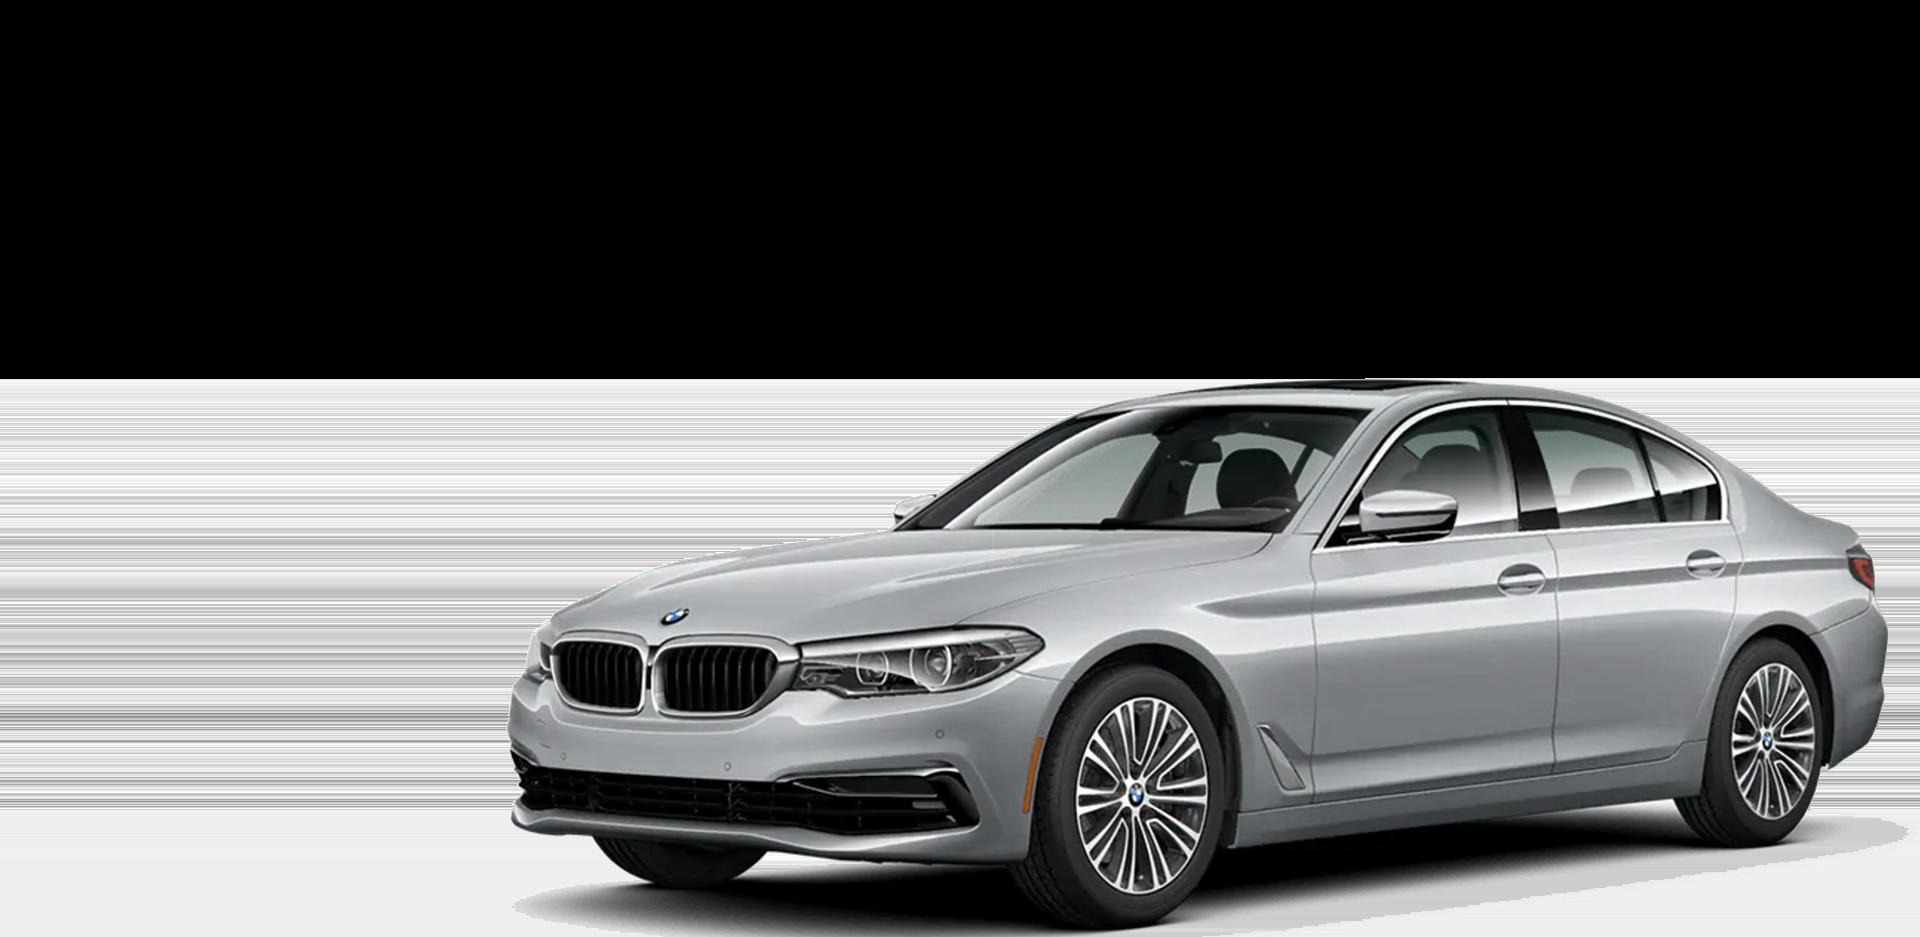 5 Series BMW Century West BMW